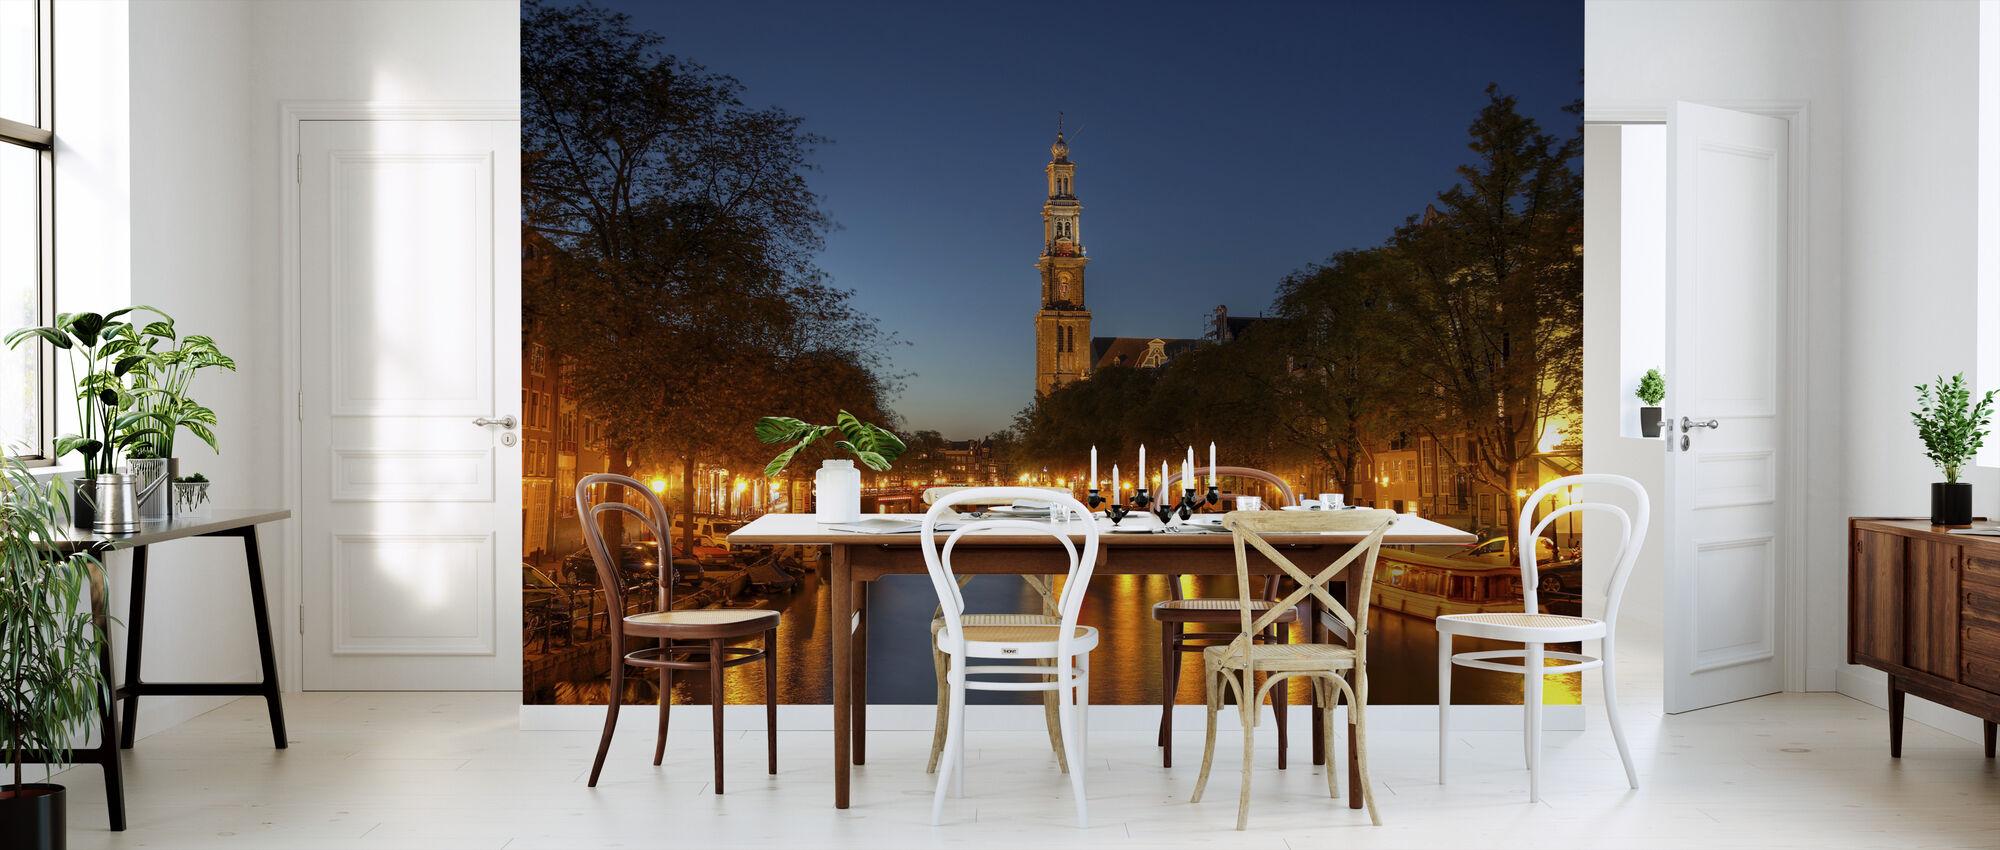 Prinsengracht Canal in Amsterdam - Wallpaper - Kitchen